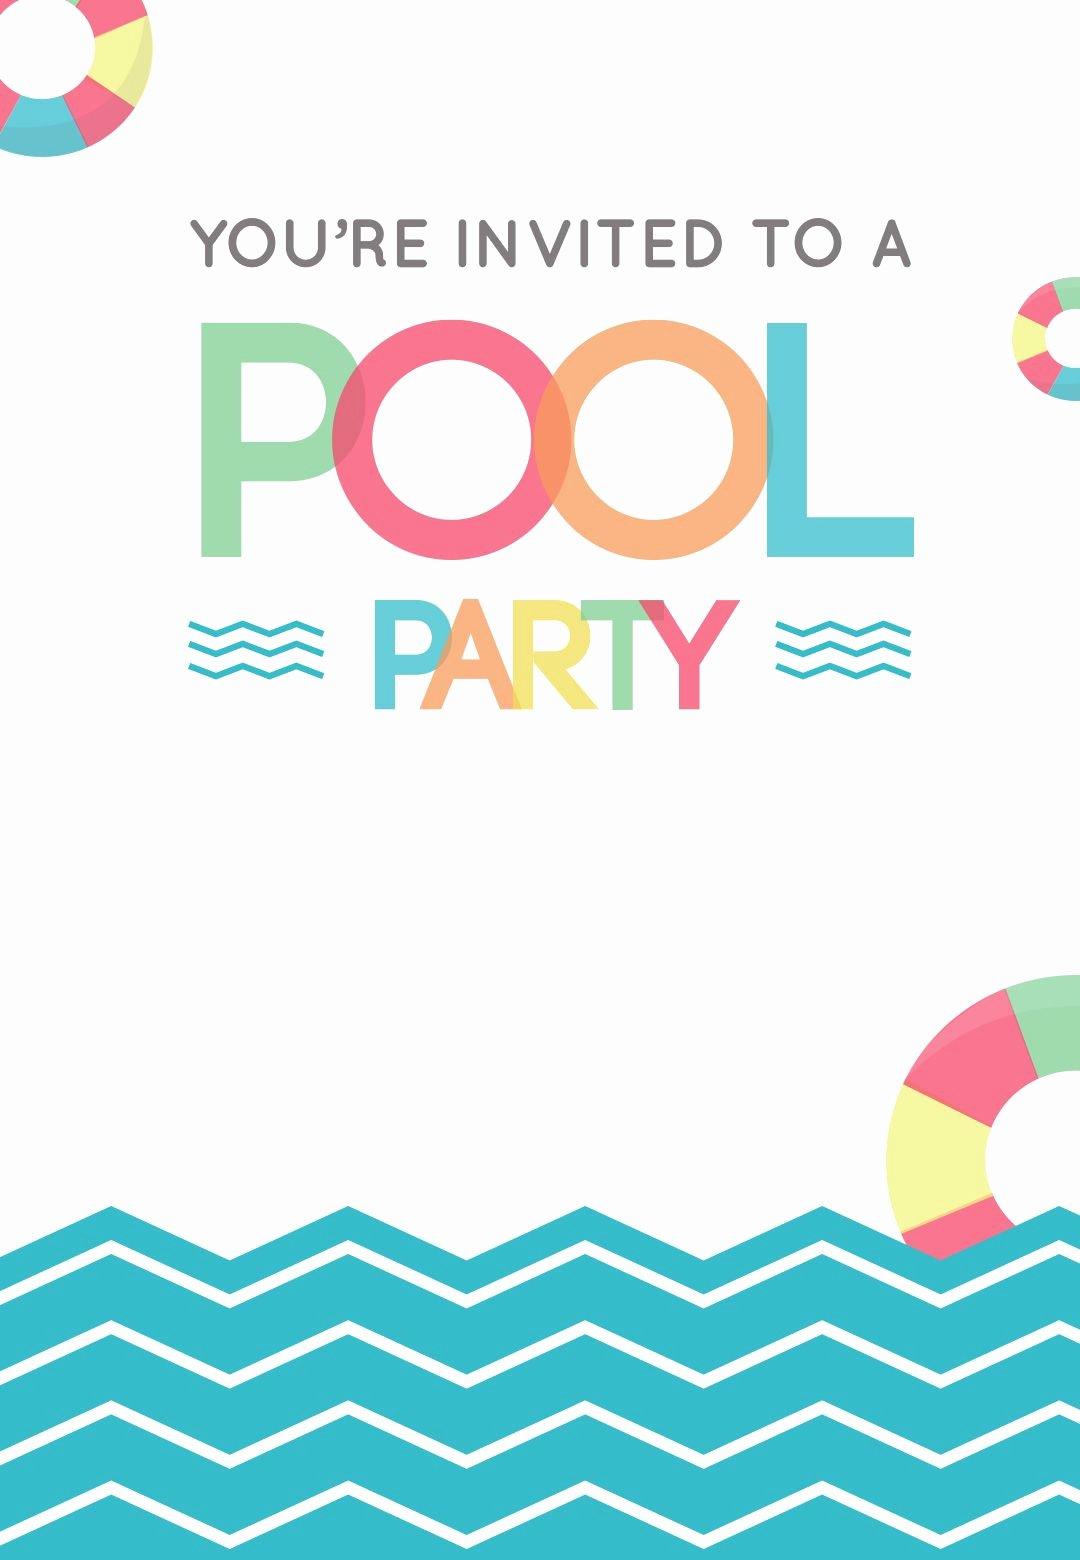 Summer Party Invitation Template Fresh Fun afternoon Free Printable Summer Party Invitation